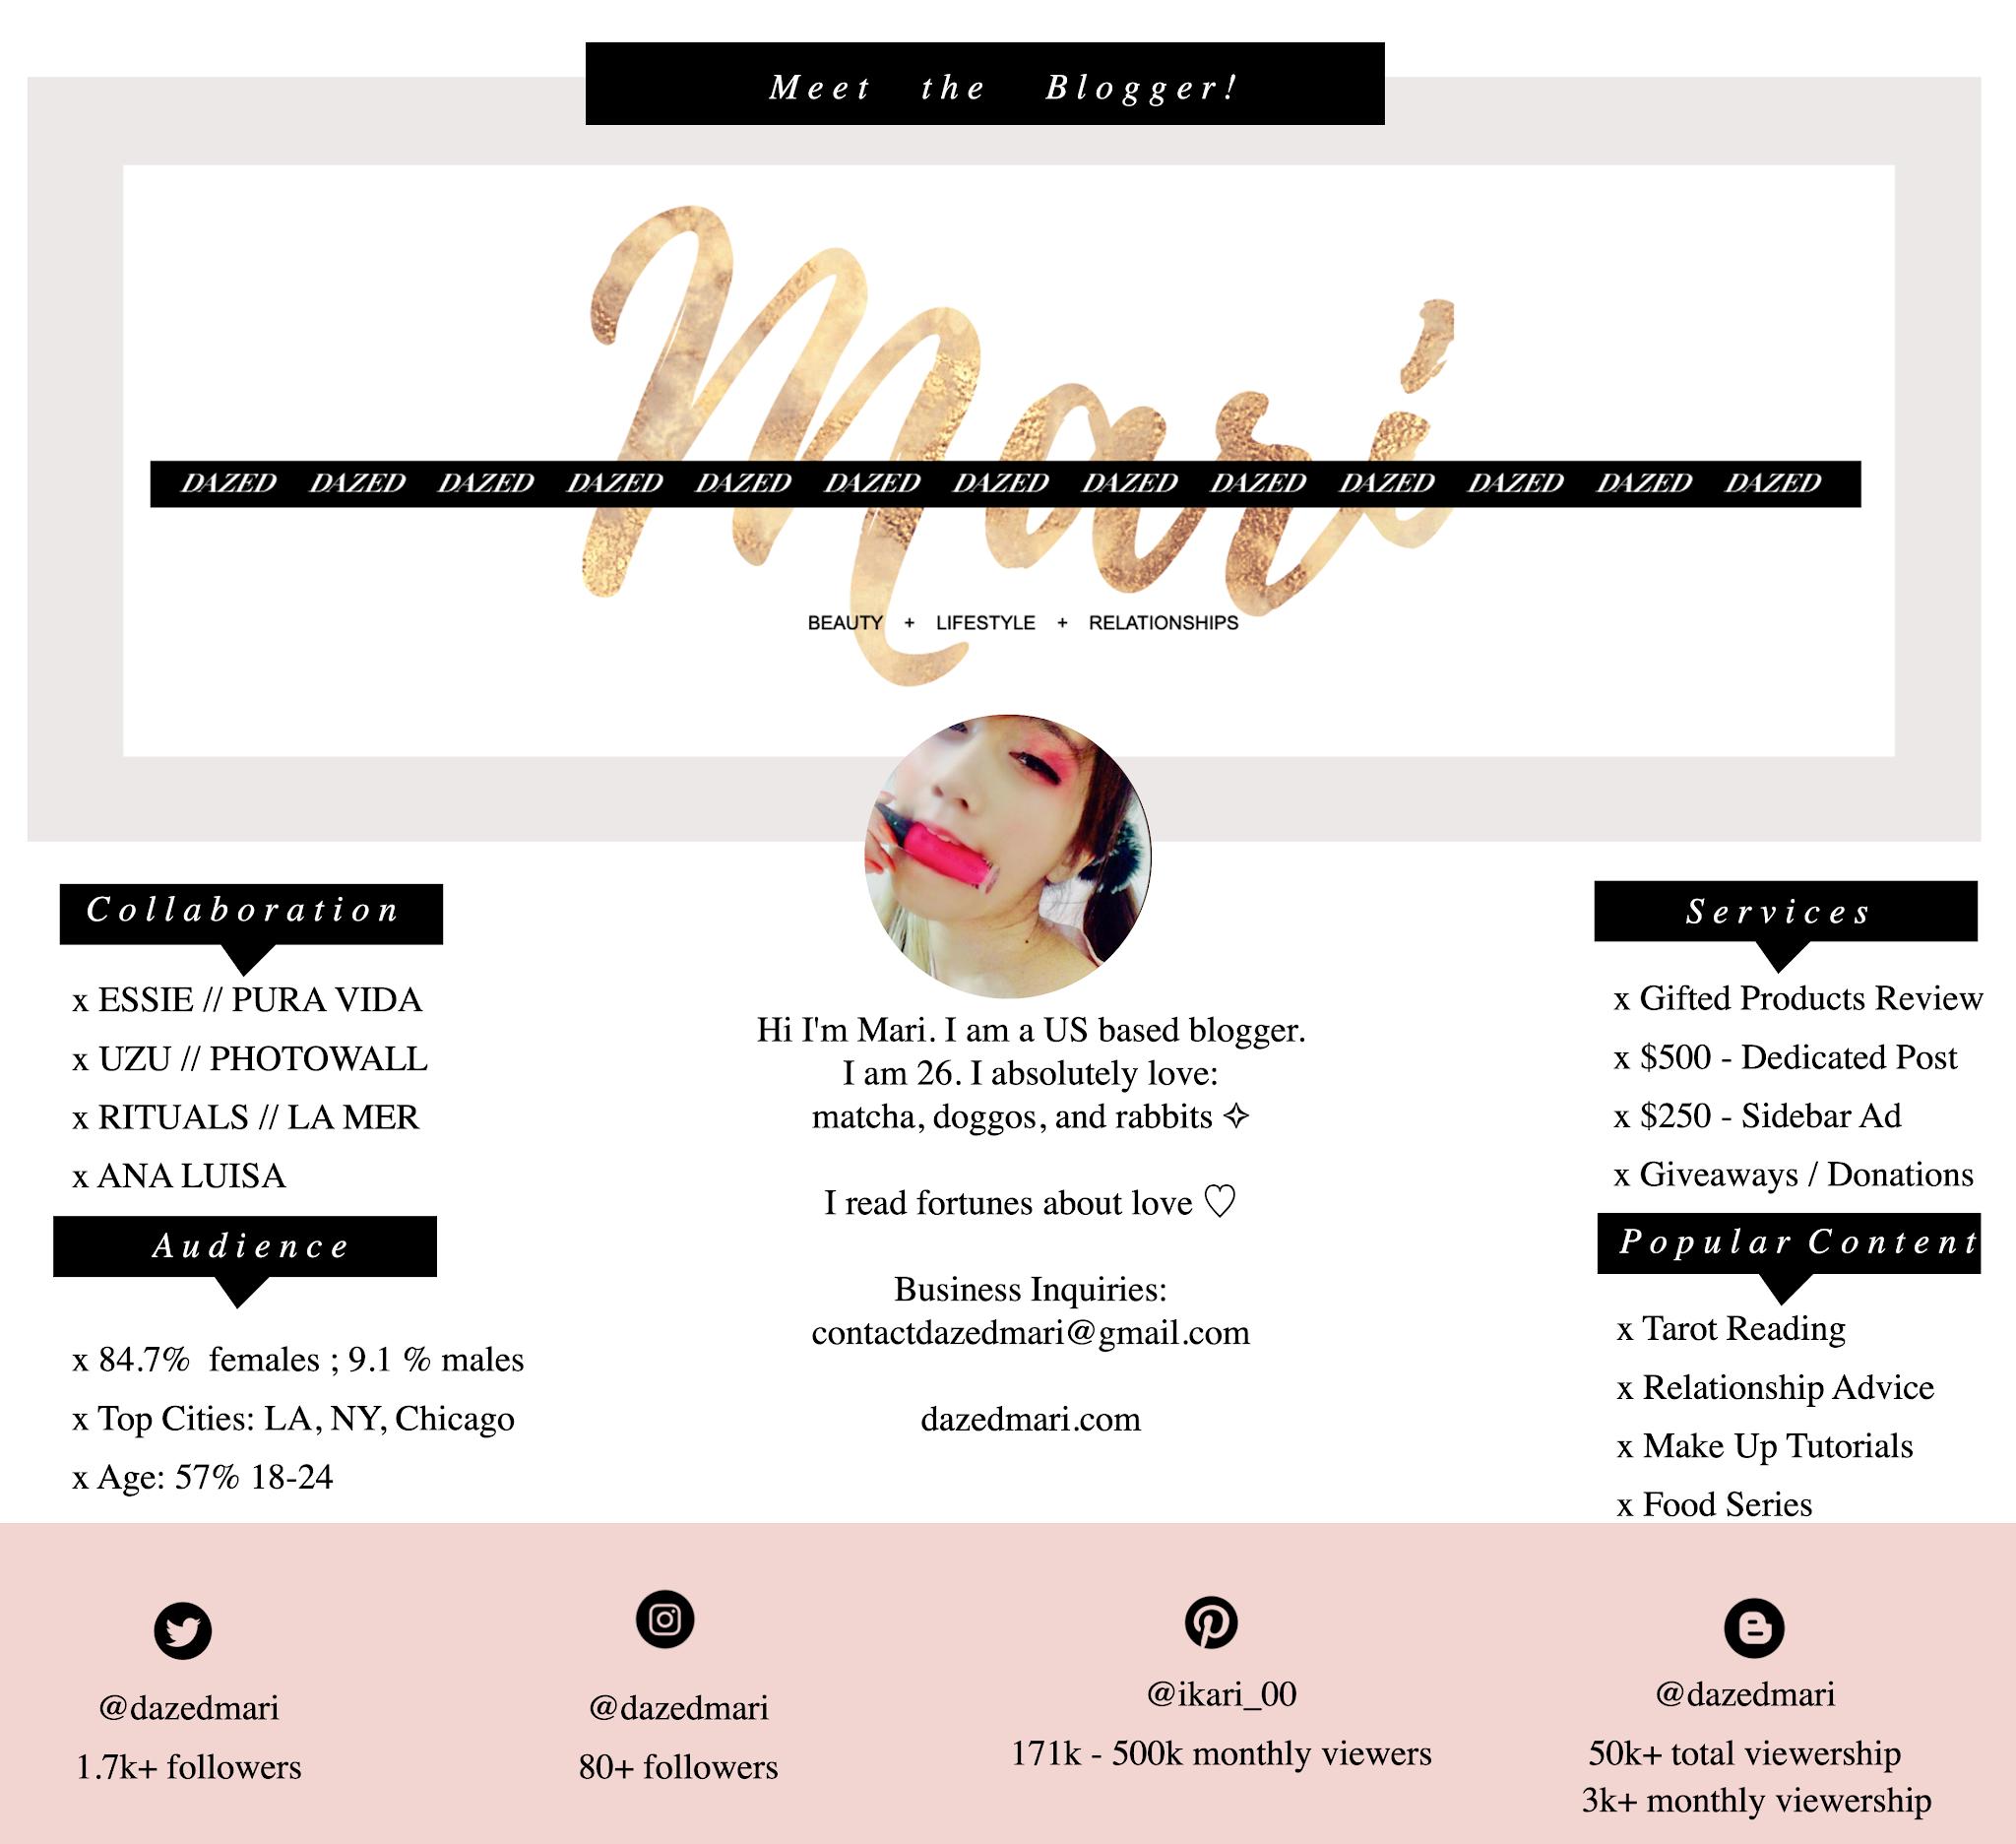 media kit, blogger media kit, collabs, ambassador, audience, popular posts, dazed mari, mari